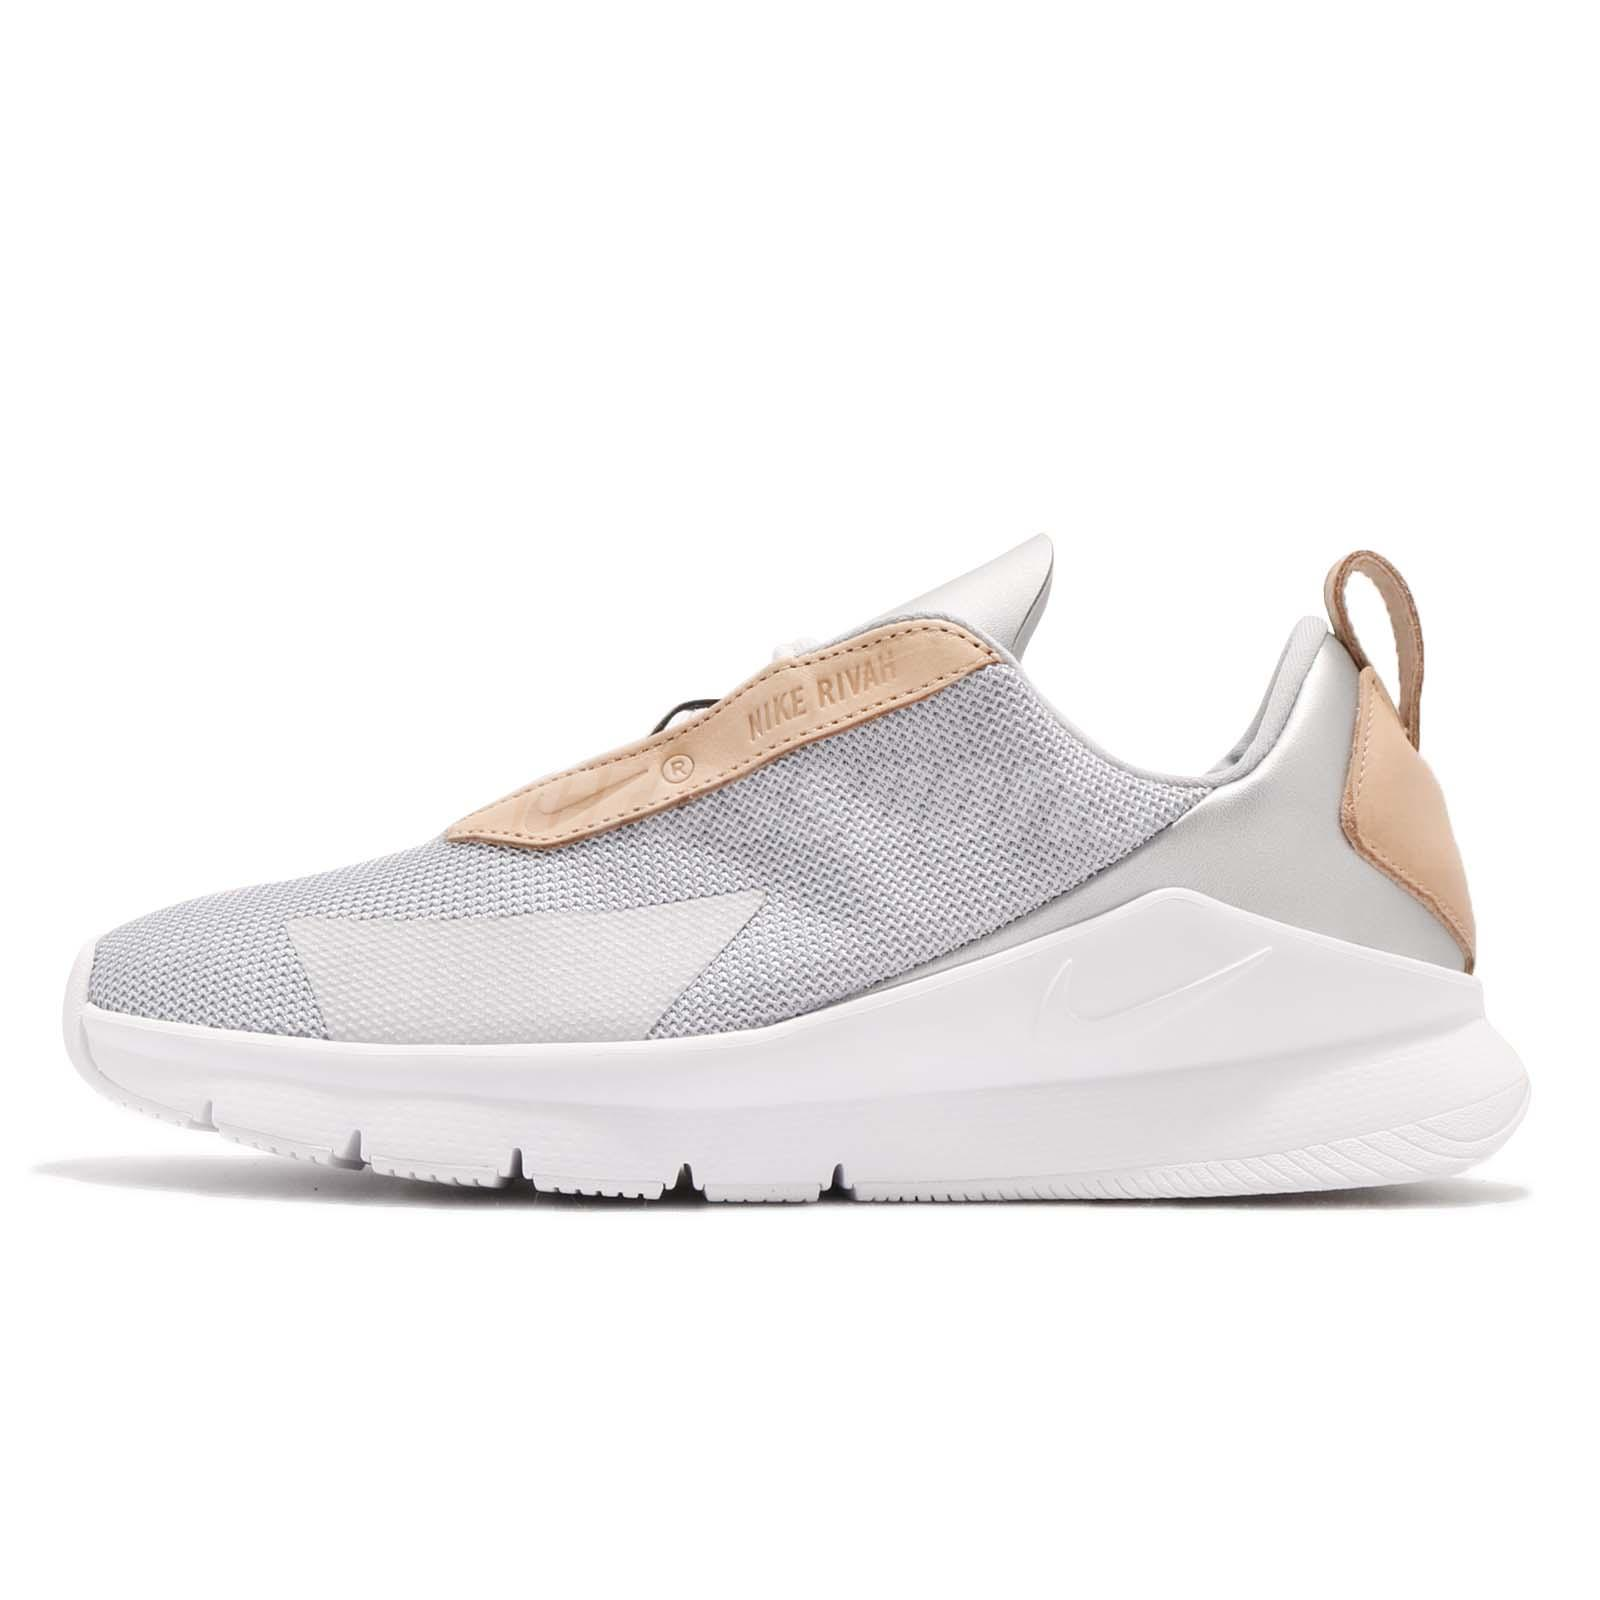 Details about Nike Wmns Rivah SE PRM Premium Metallic Silver White Women  Shoes AO0796-001